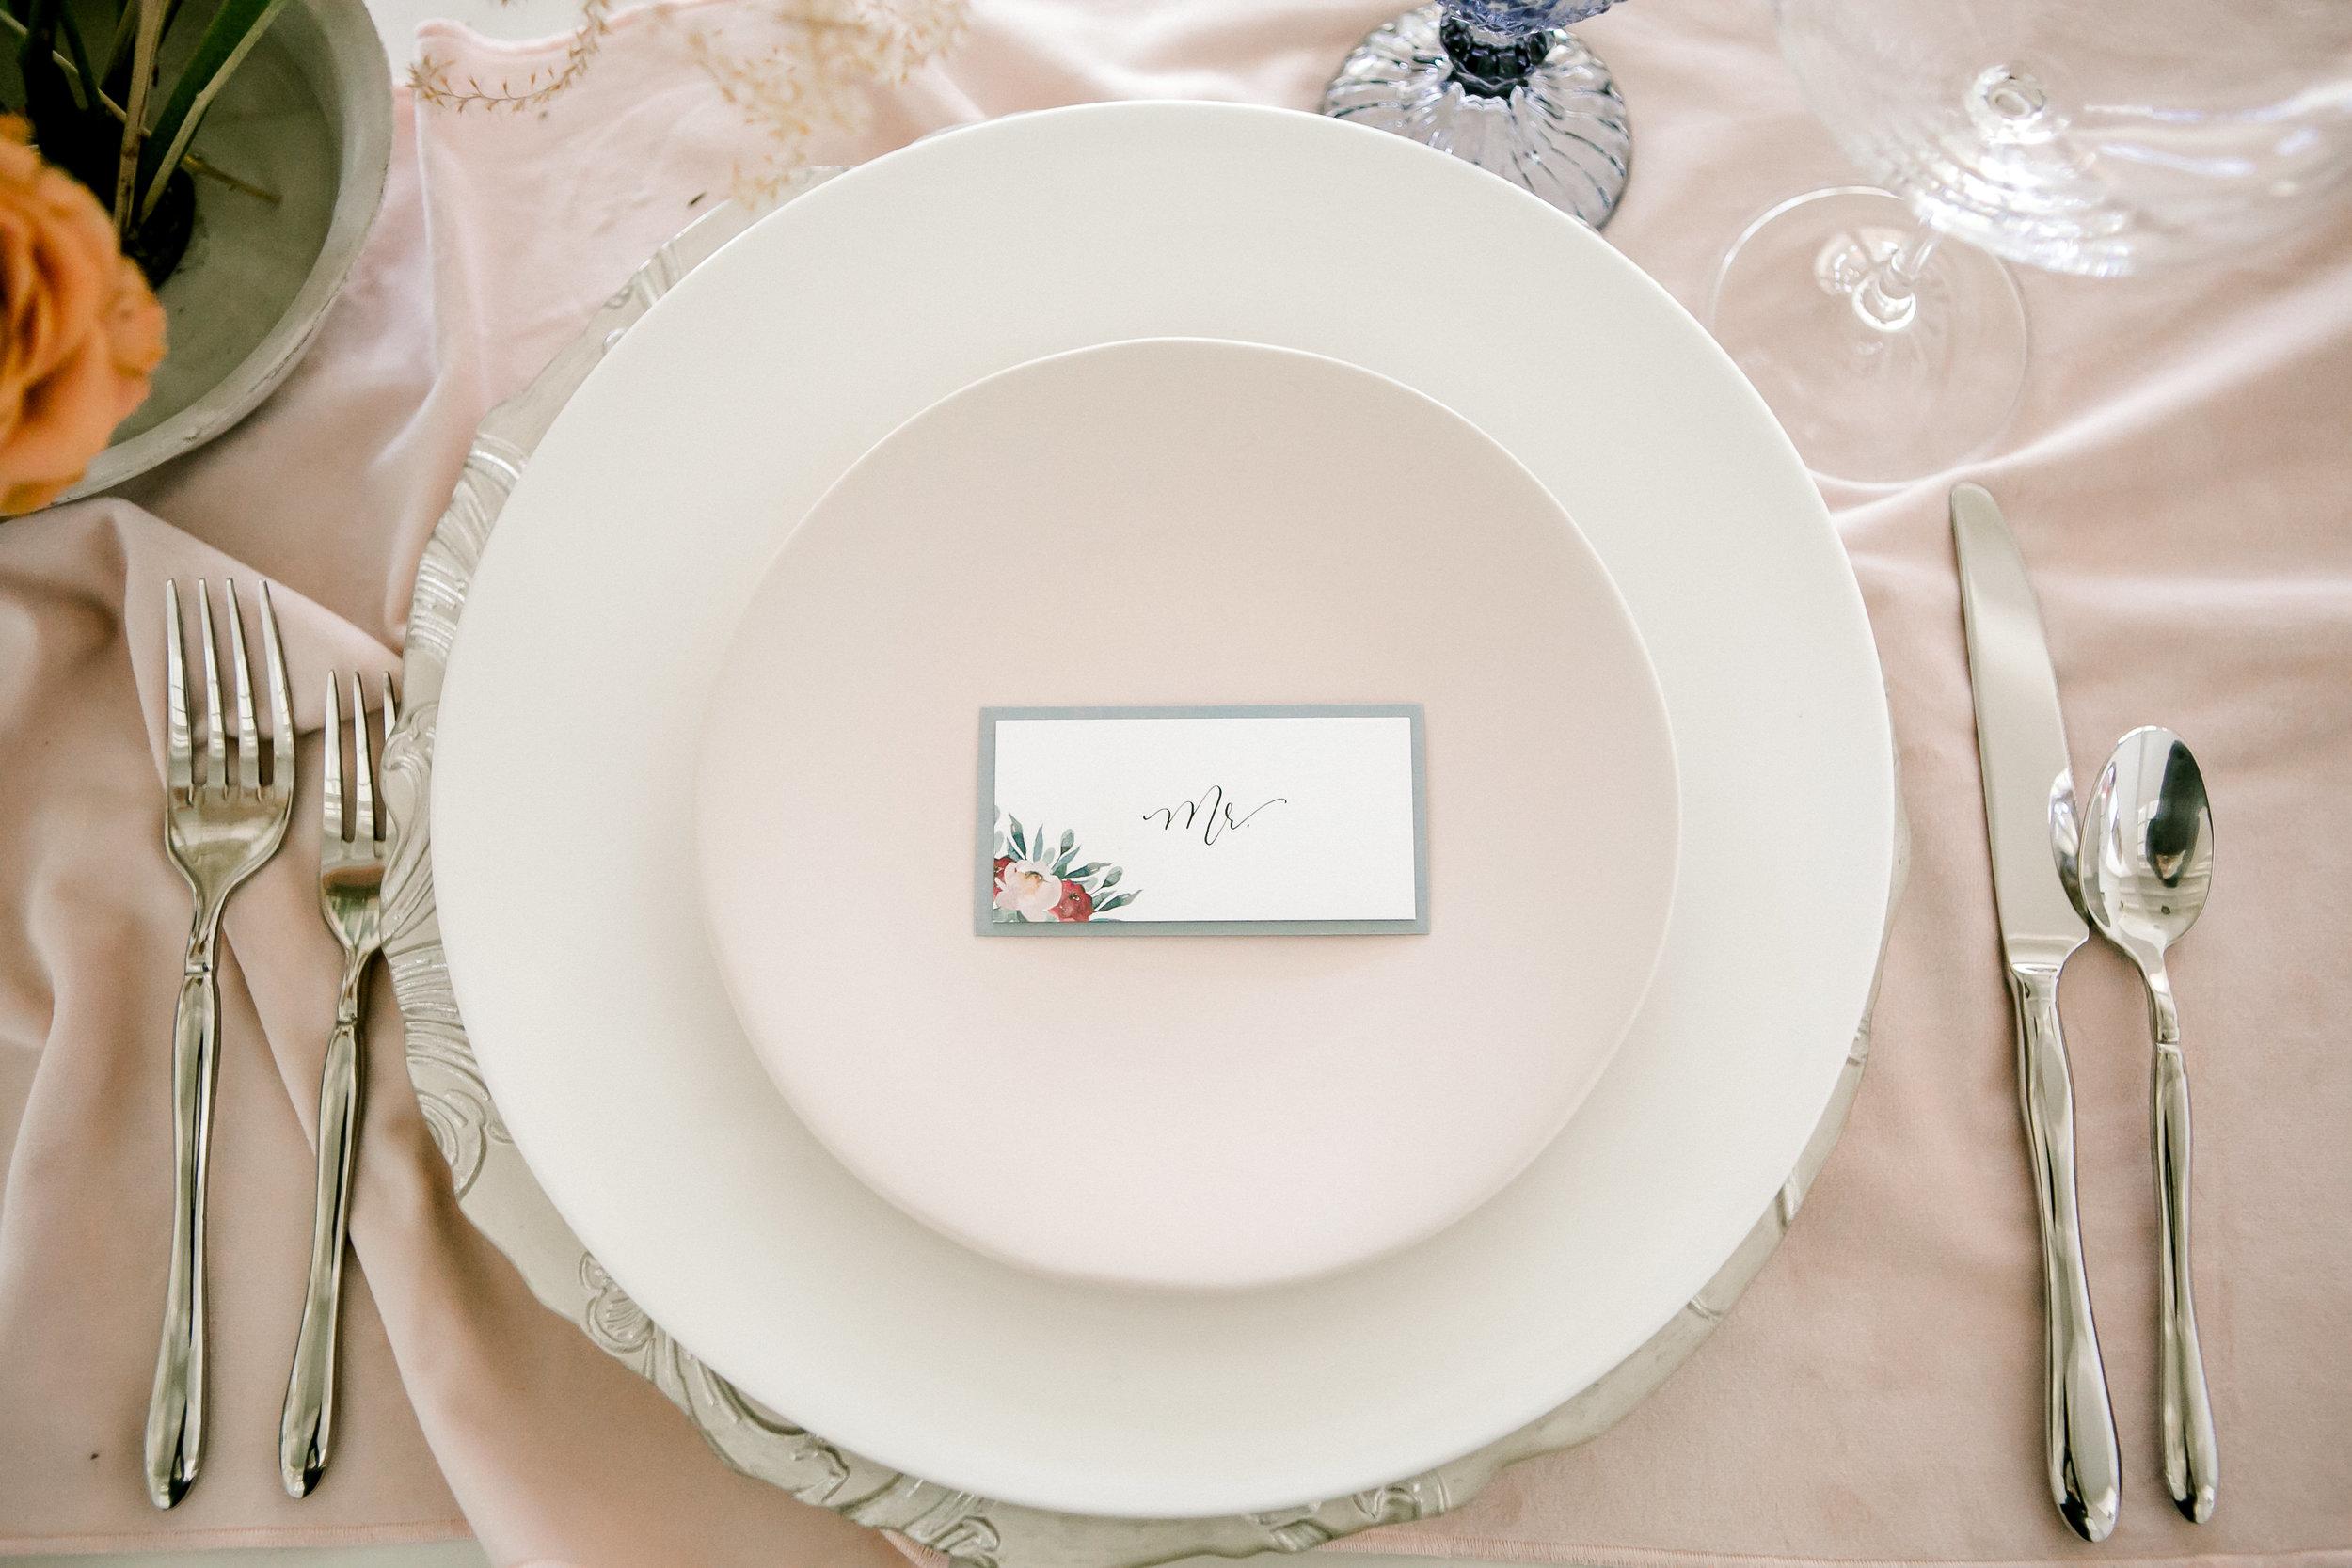 Festivities-Event-Center-Wedding-Oklahoma-City-Wedding-Photographer-Emily-Nicole-Photo-200.jpg